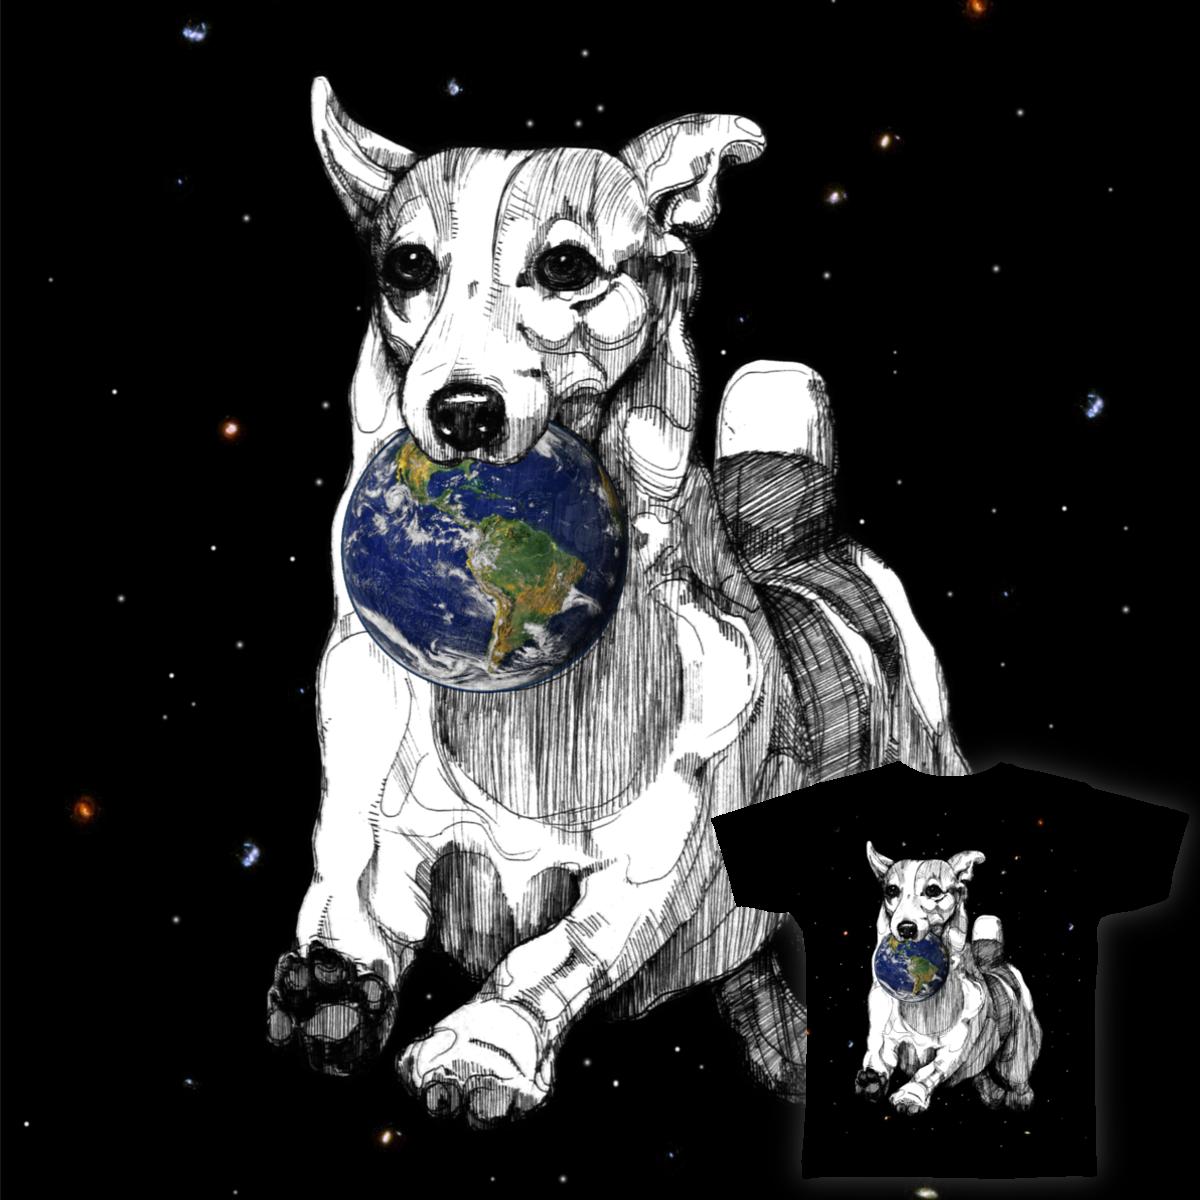 space dog by aszna on Threadless